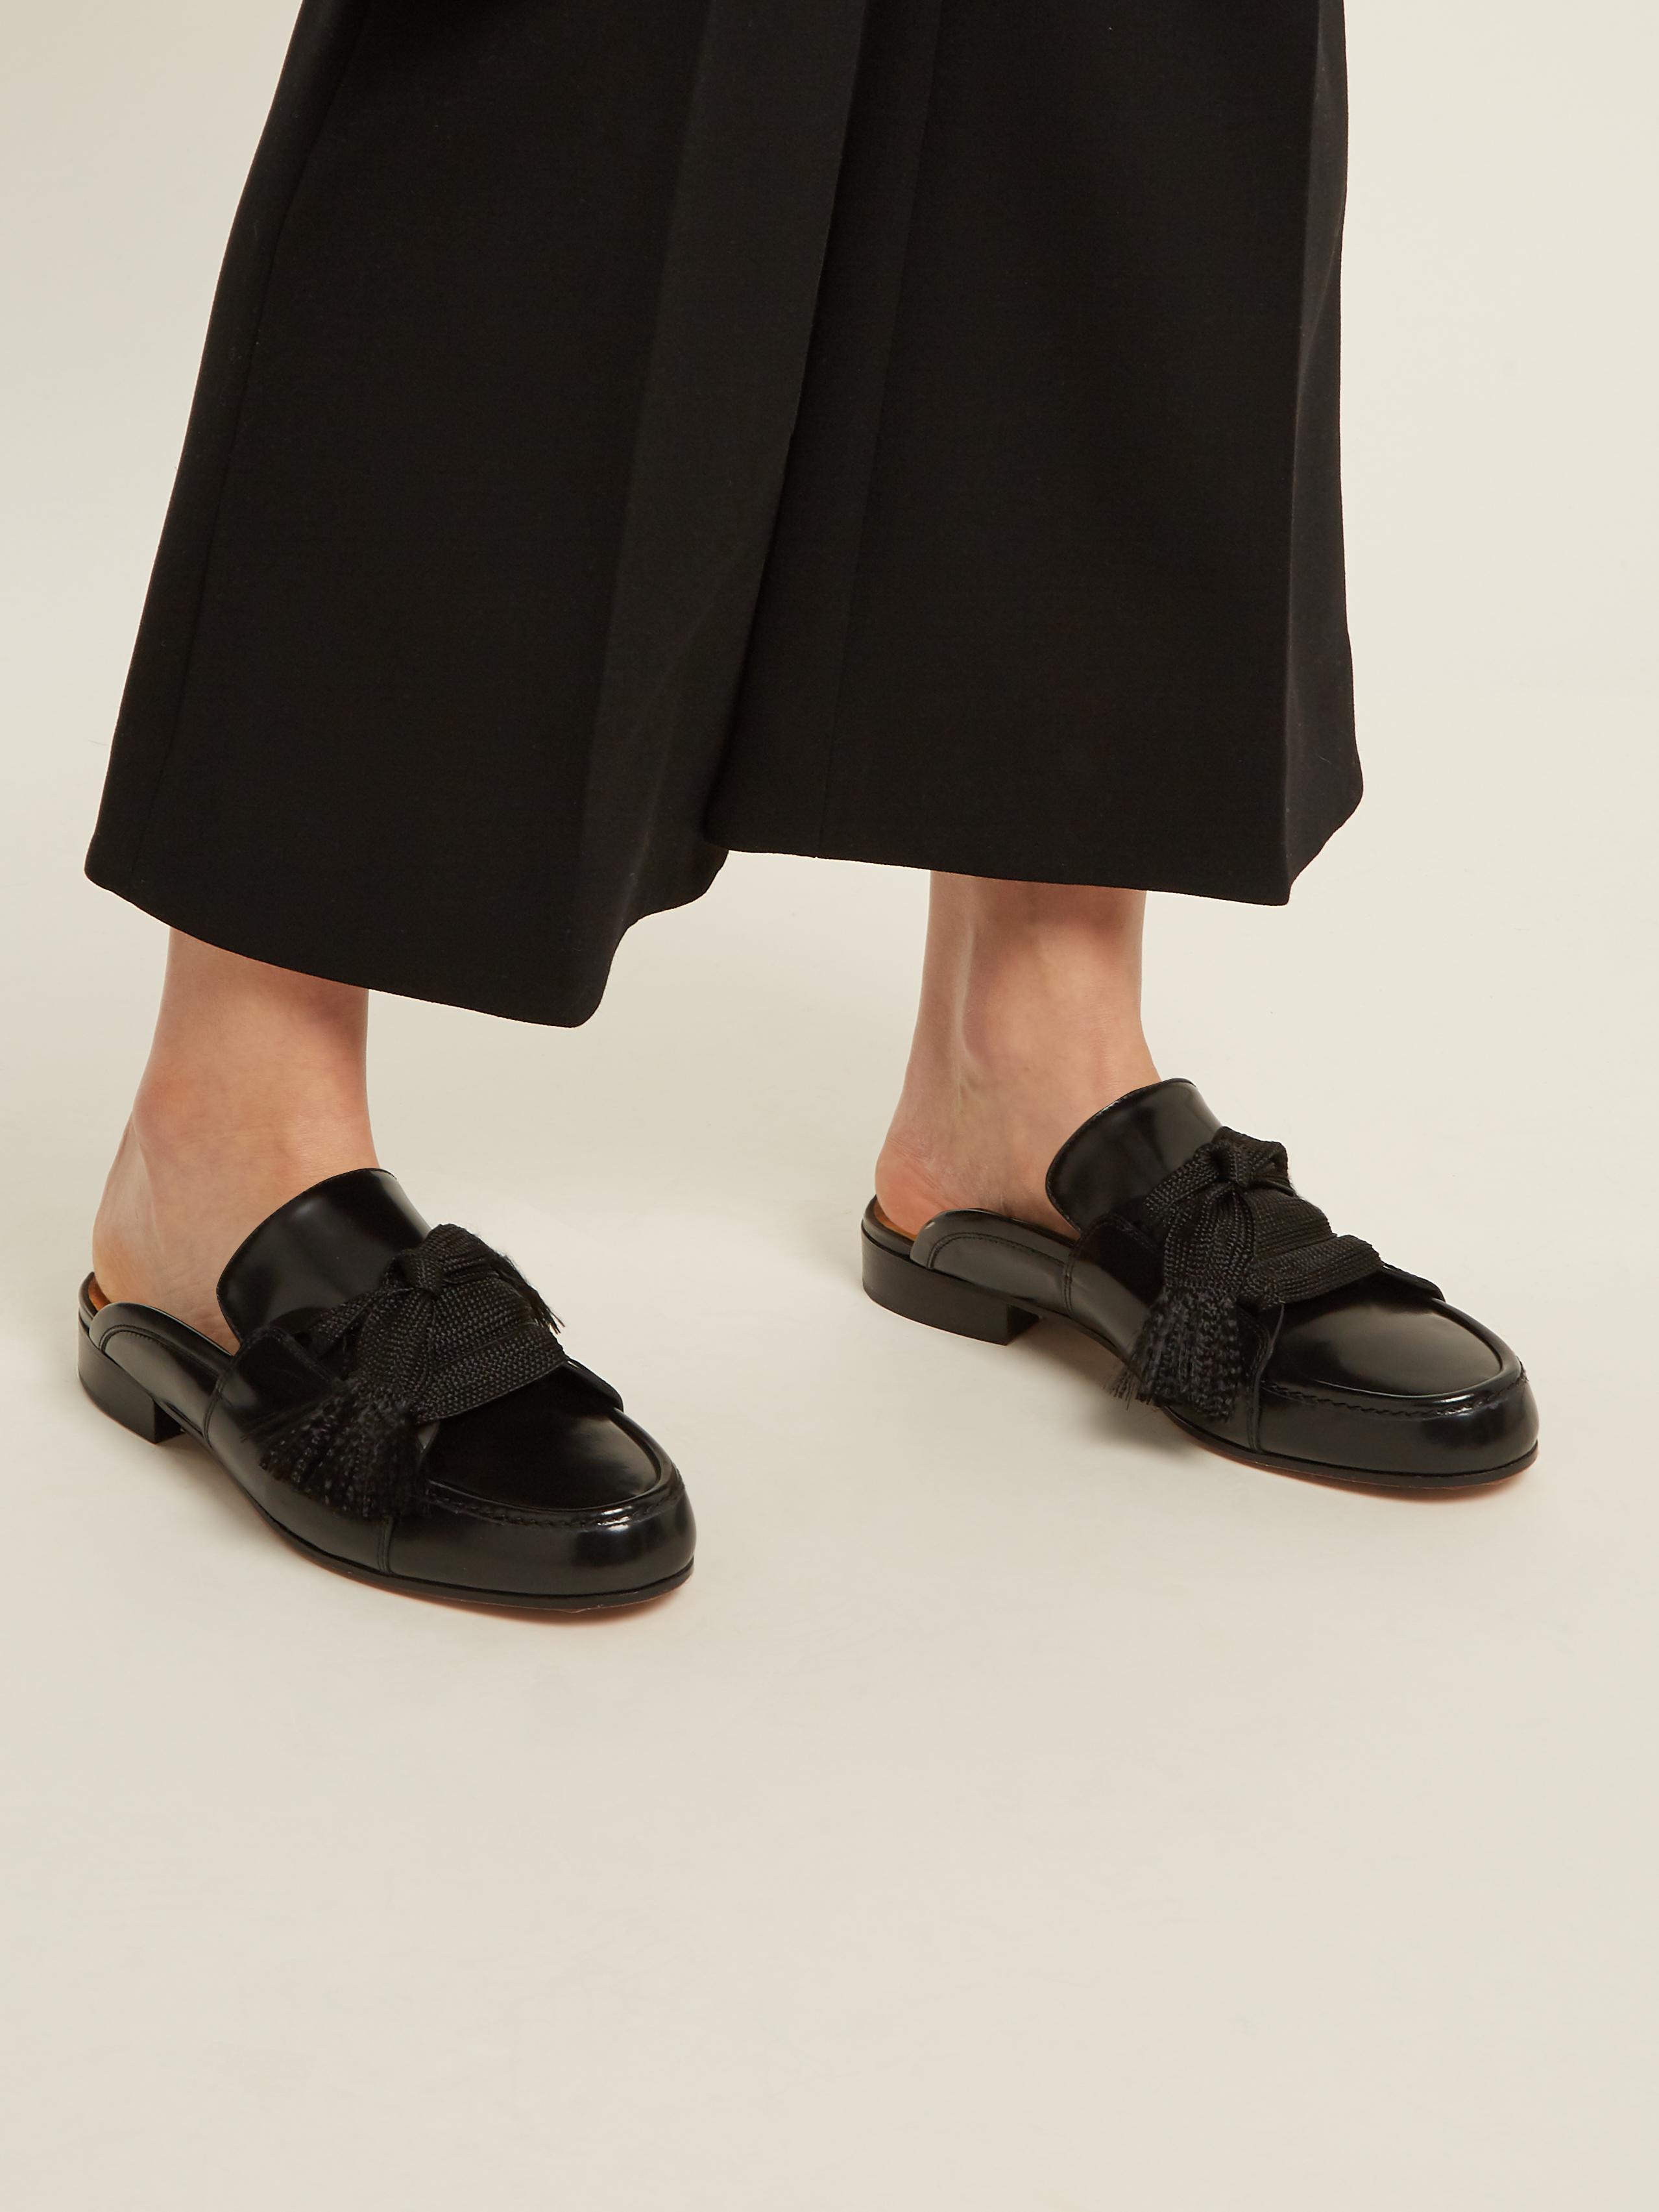 Chloé Harper loafers Comfortable For Sale K2lNbRh